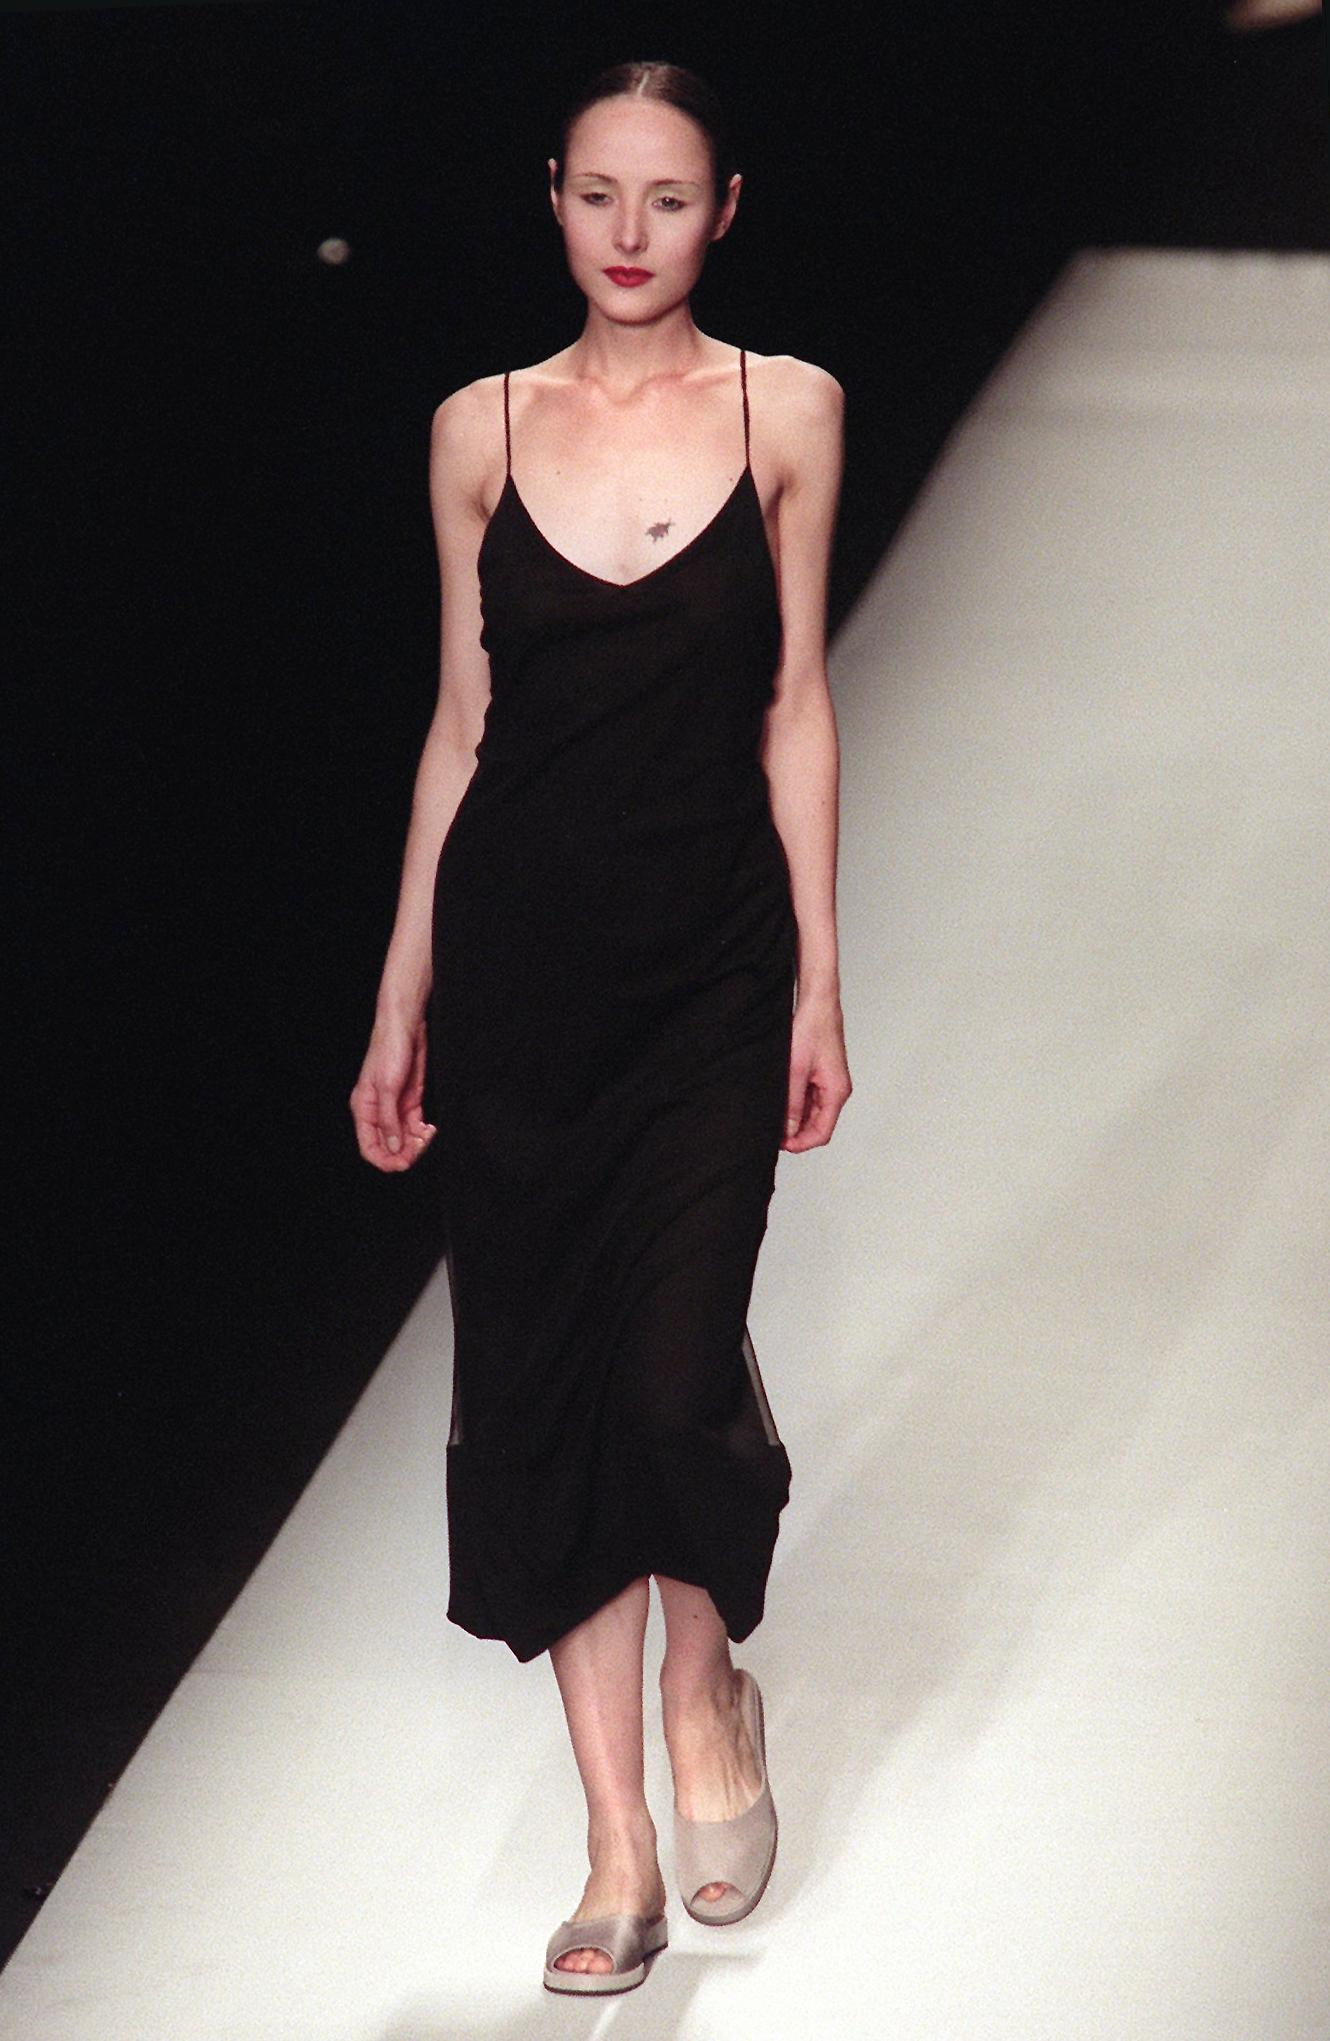 A model wears a black slip dress during the John Bartlett fashion show